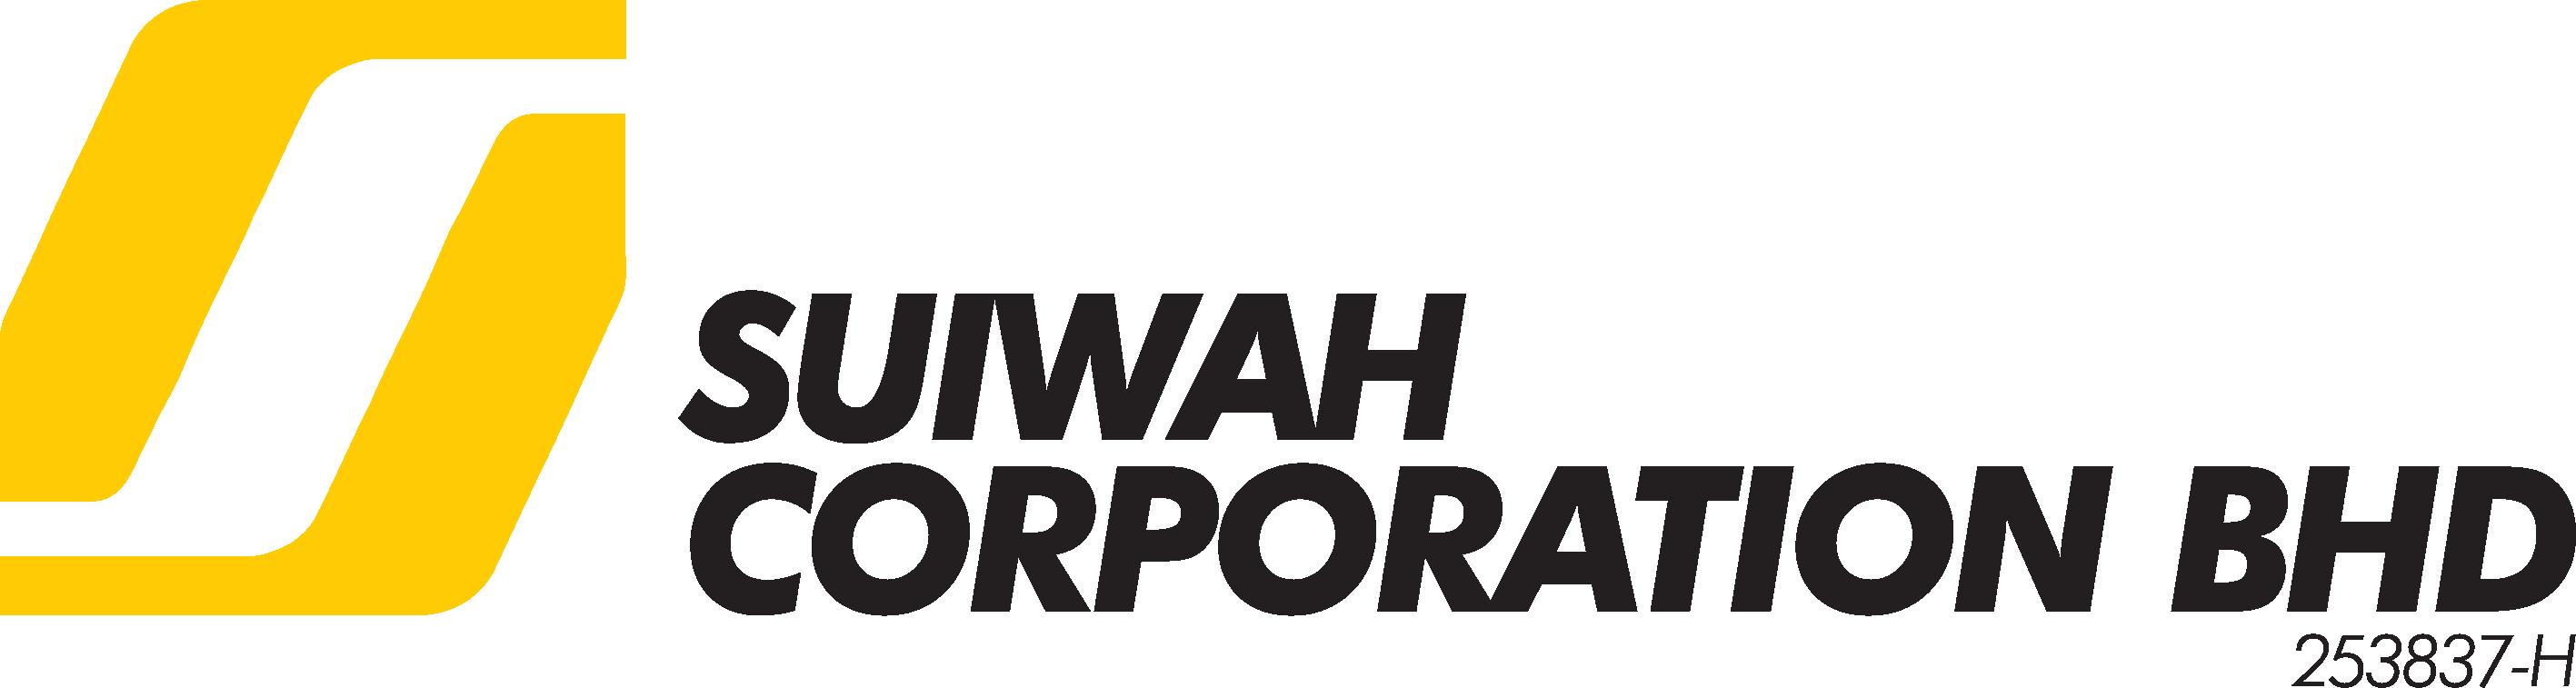 SUIWAH | SUIWAH CORPORATION BHD